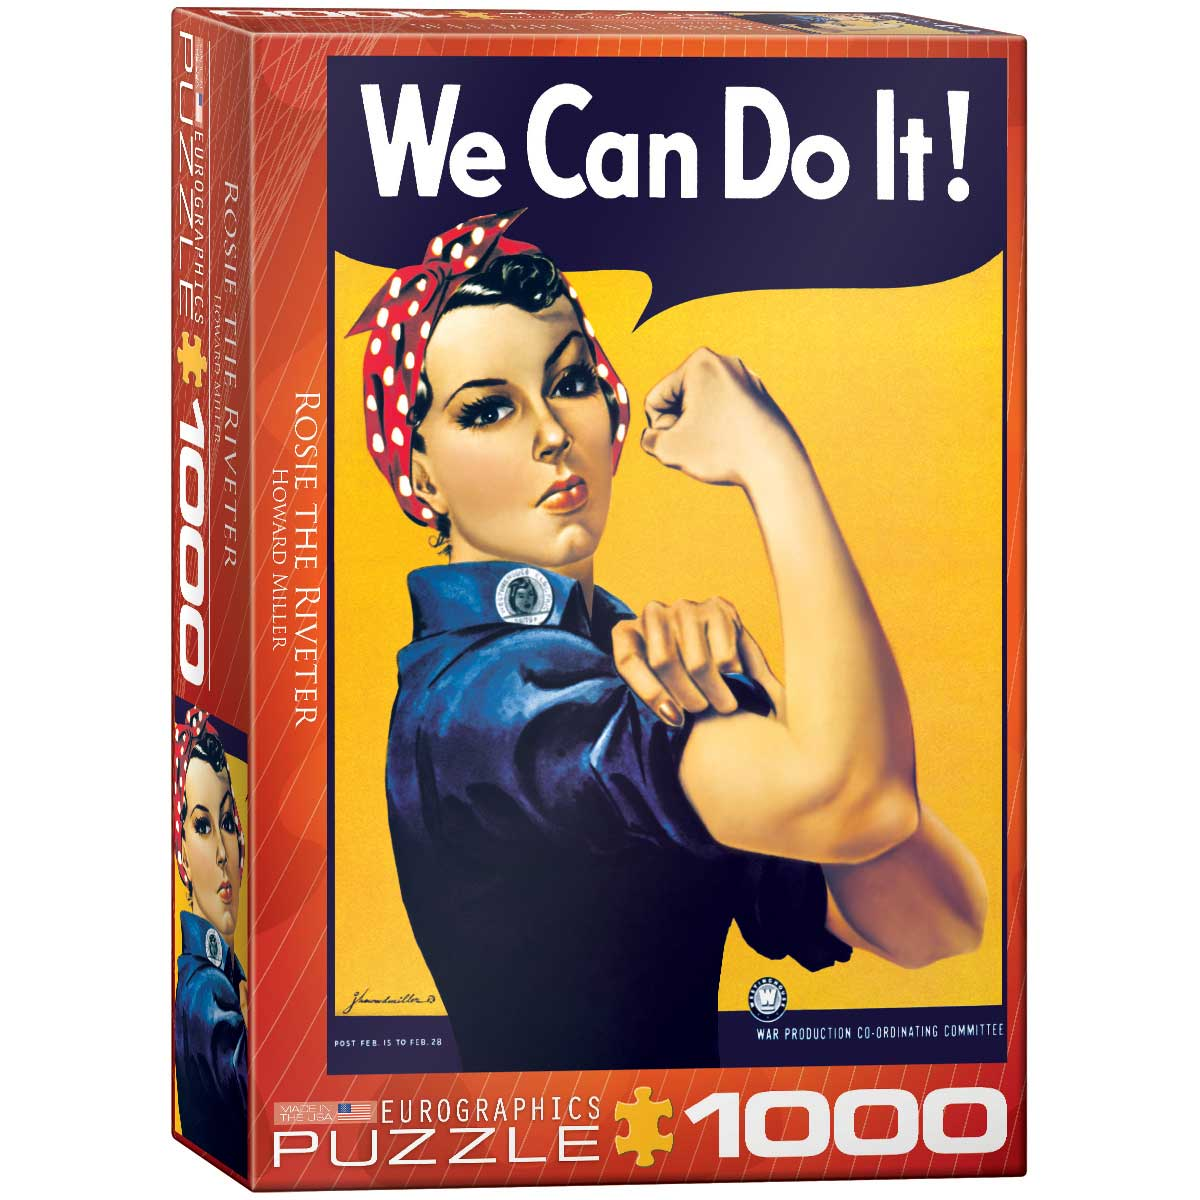 Puzzle Eurographics Rosie La Remachadora, 1000 Piezas